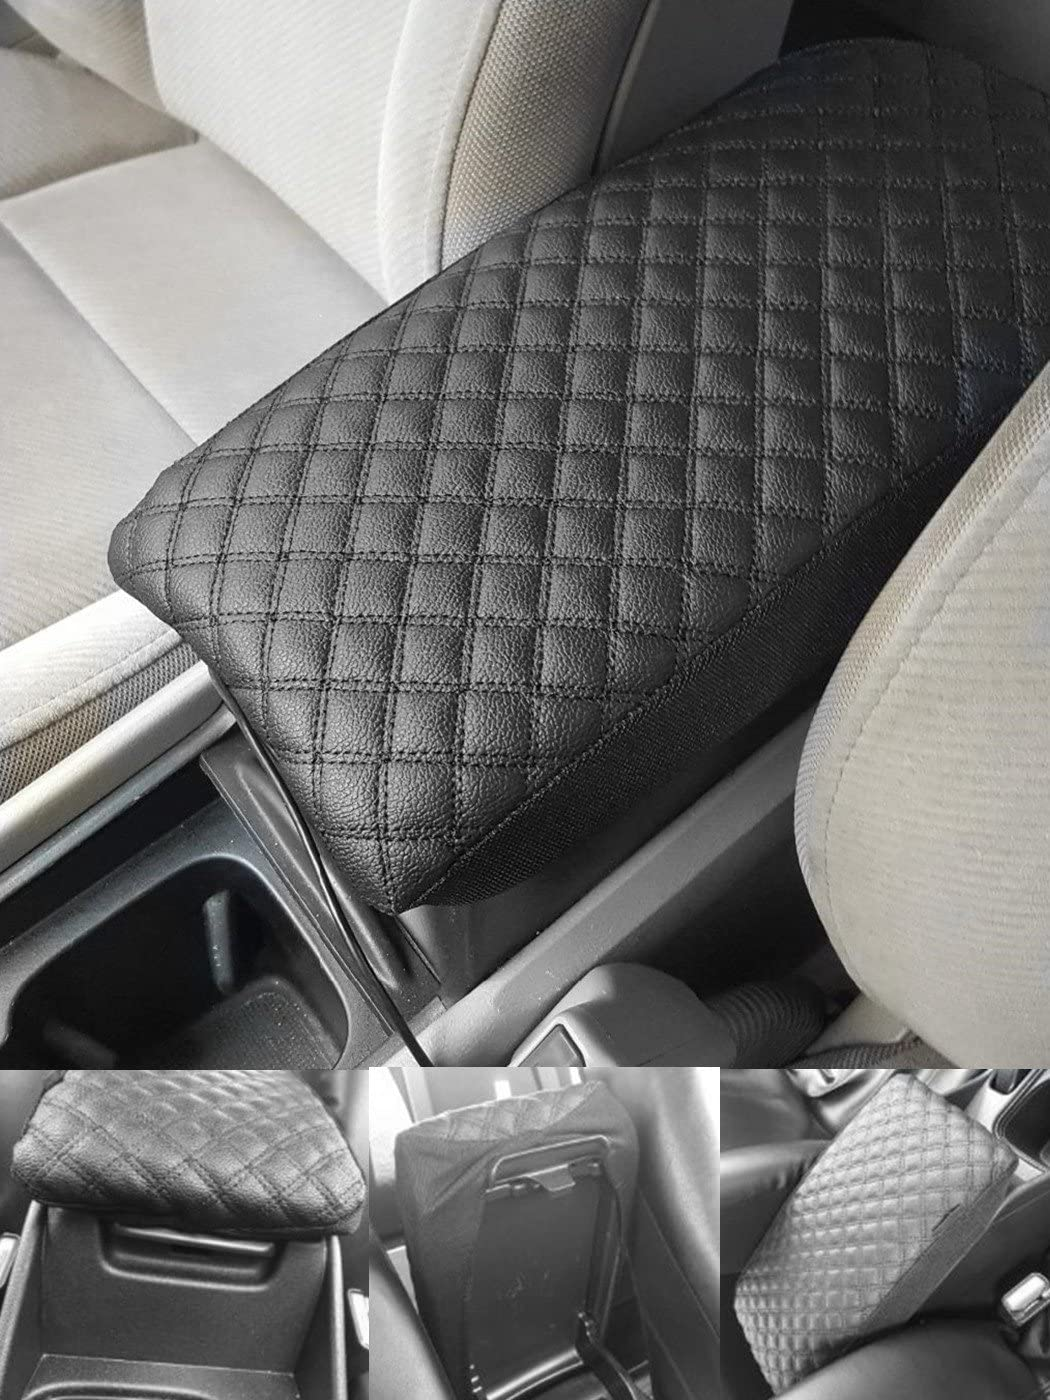 Fit for Chrysler 300 300C 2004-2010 Center Console Lid Decor Armrest Cover